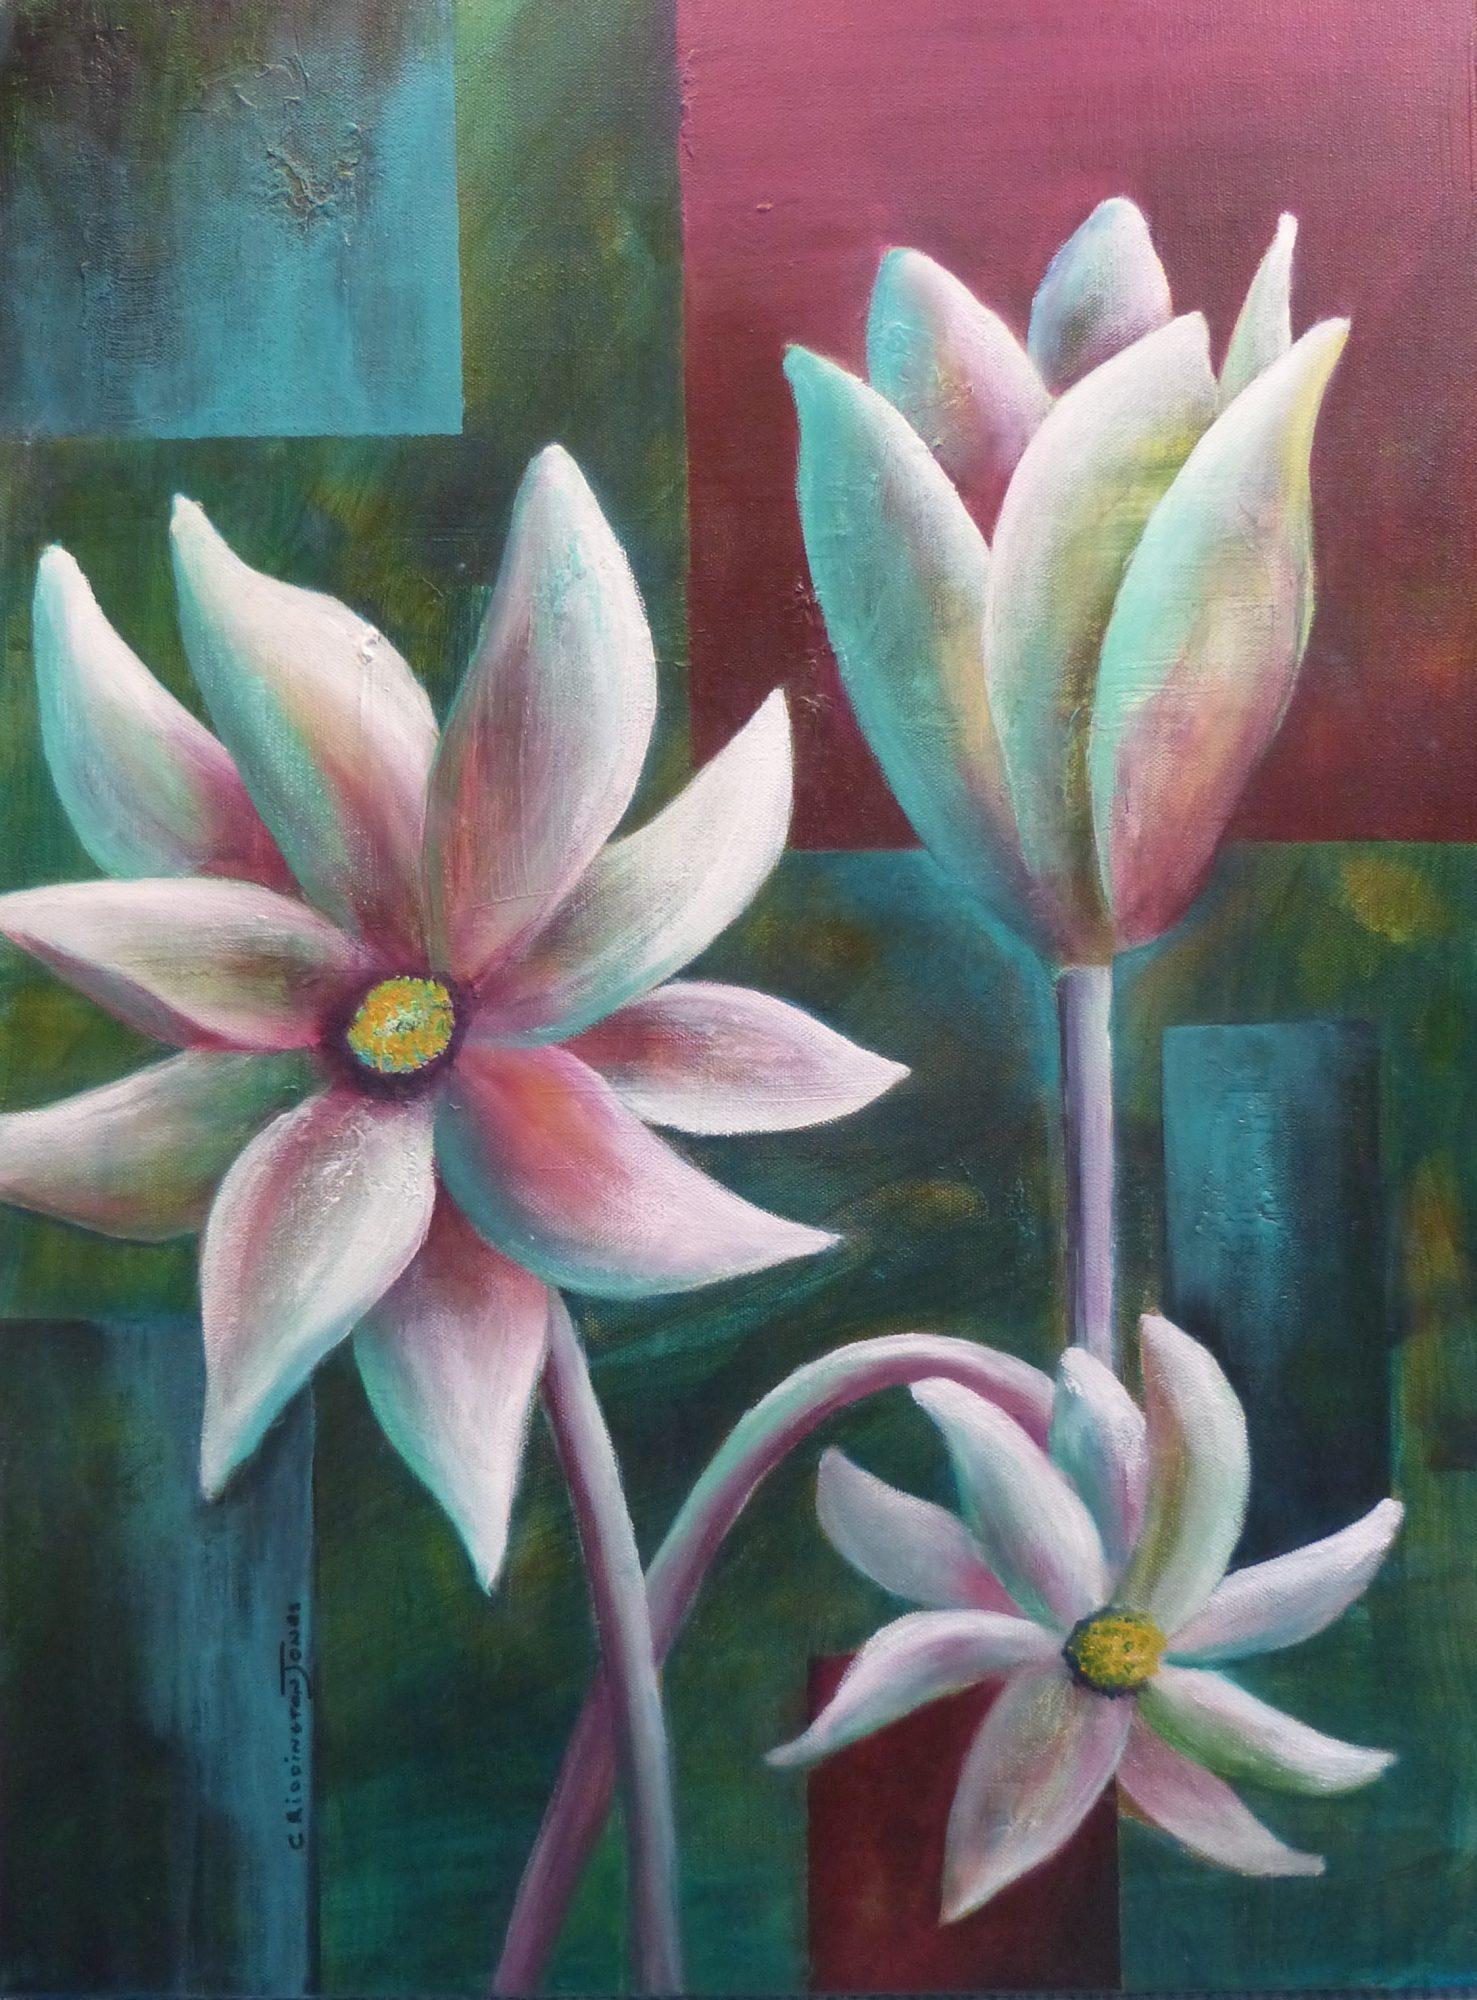 Flannel Flowers, Mixed Media, 45cm X 60cm Clare Riddington Jones